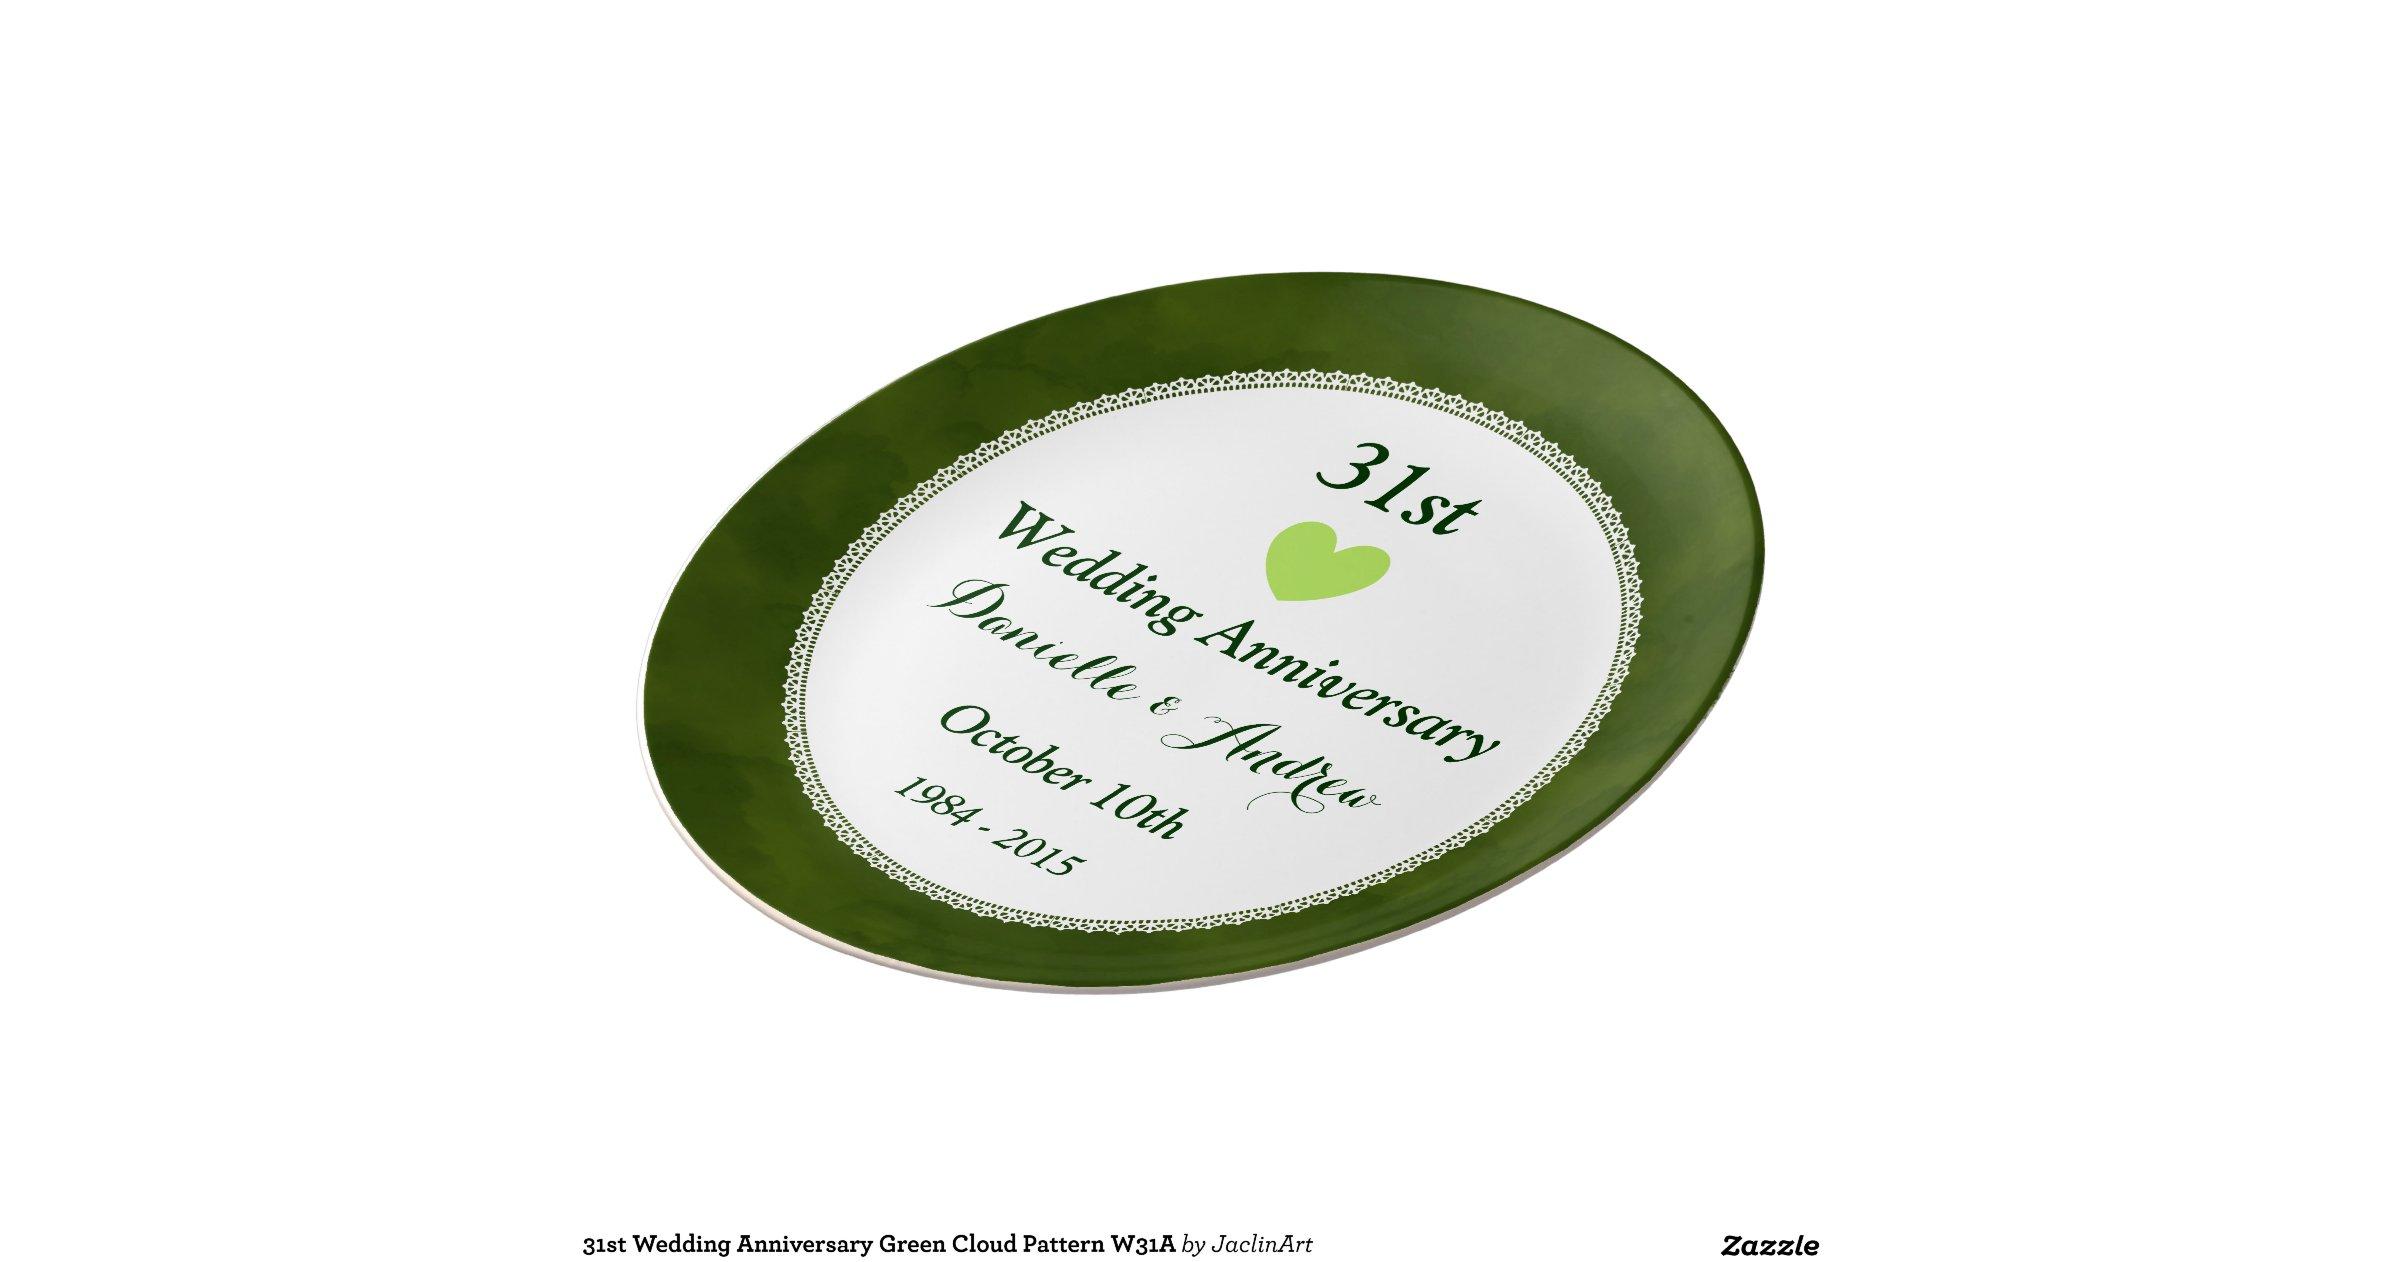 31 Wedding Anniversary Gift: 31st Wedding Anniversary Green Cloud Pattern W31A